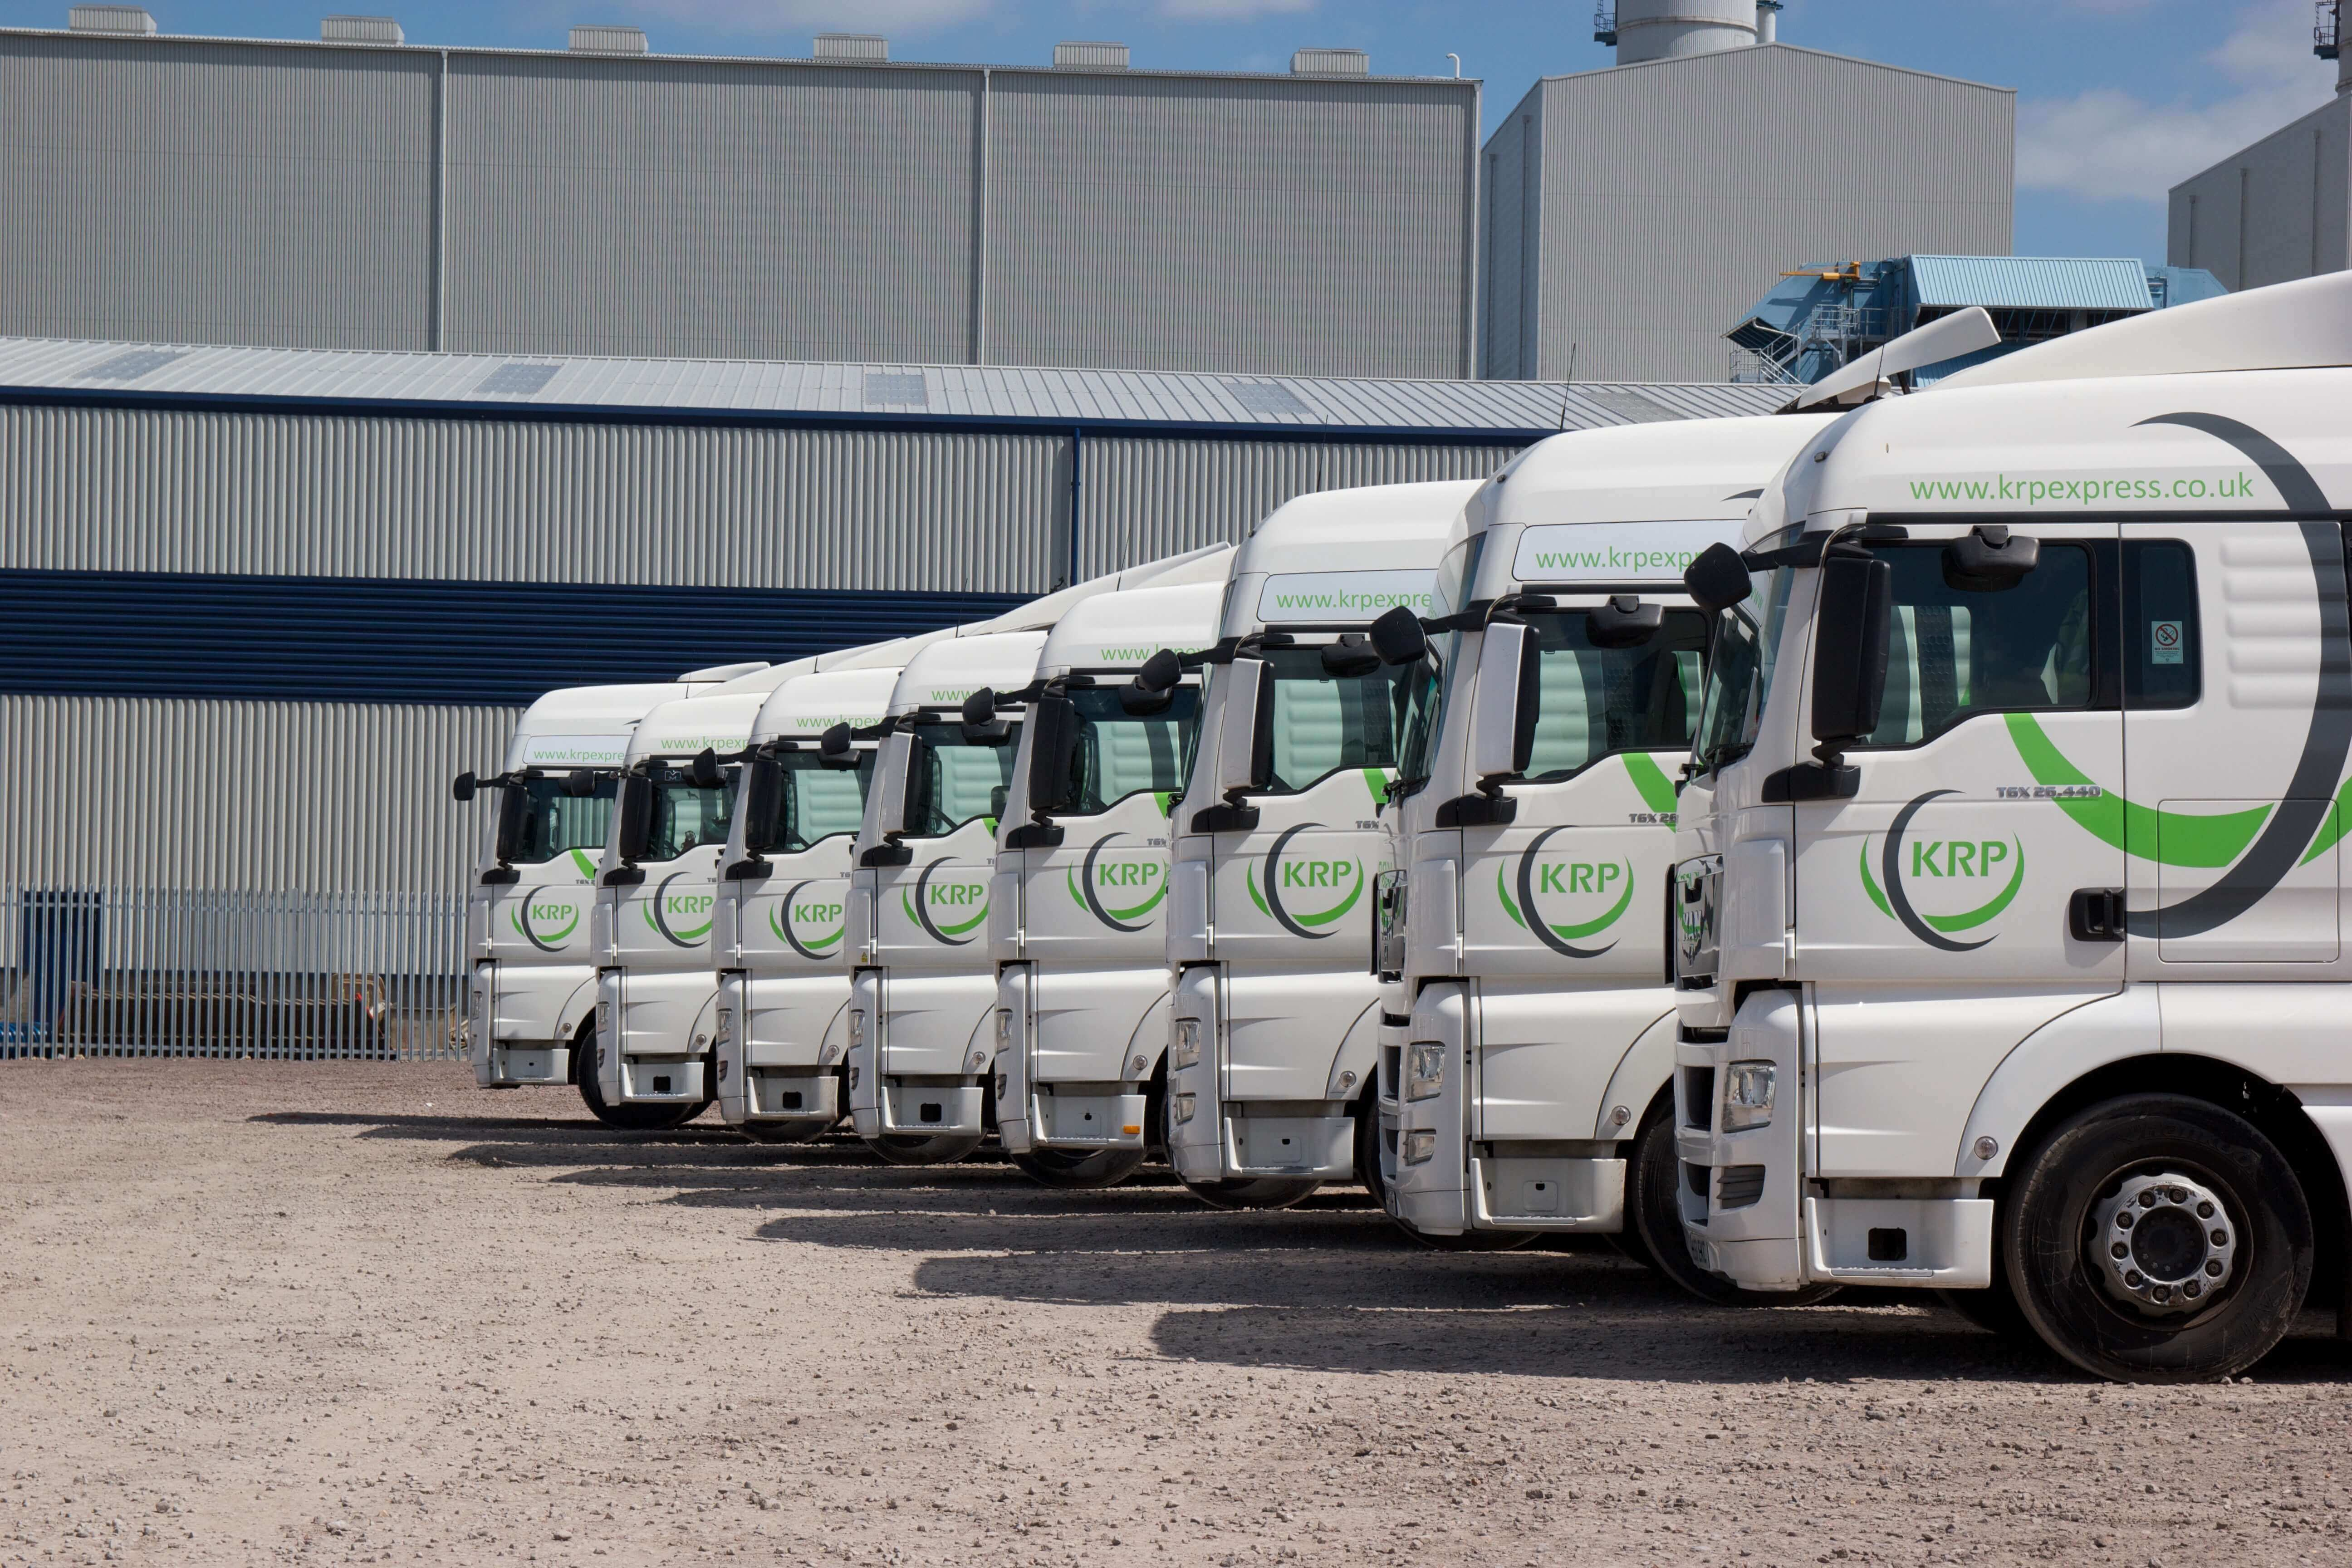 KRP Express Transport Trucks